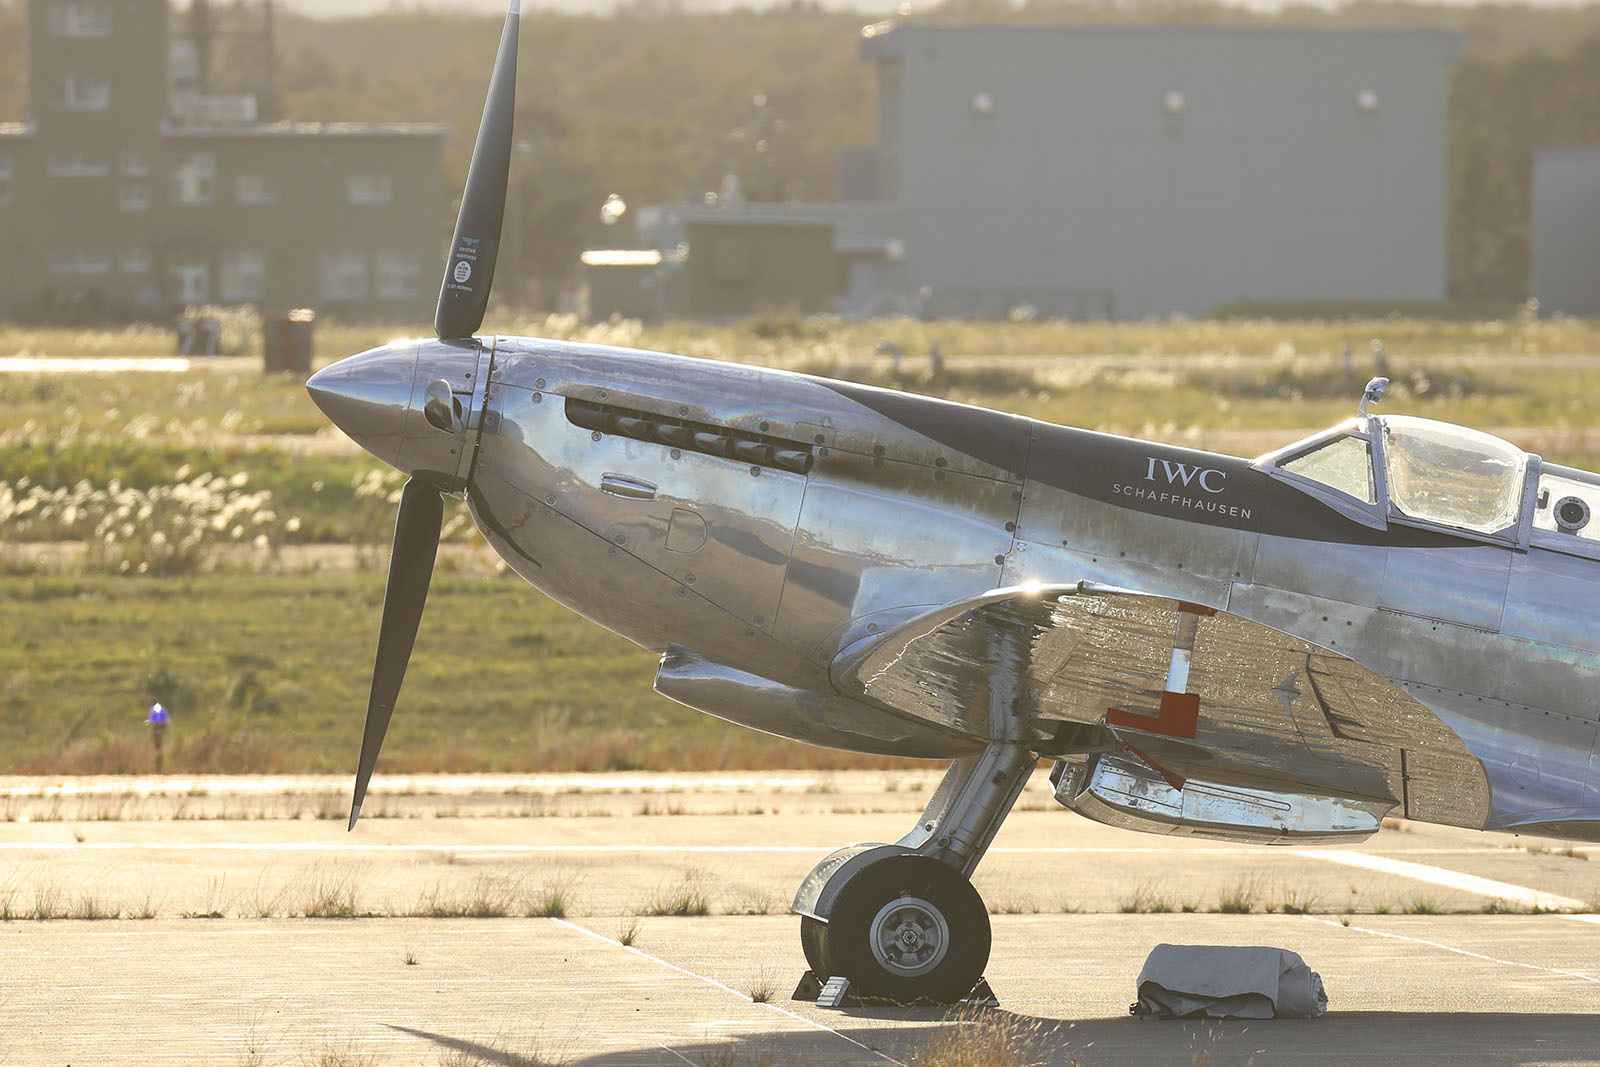 CTS 21&22SEP2019 「Silver Spitfire」_b0315809_20274128.jpg